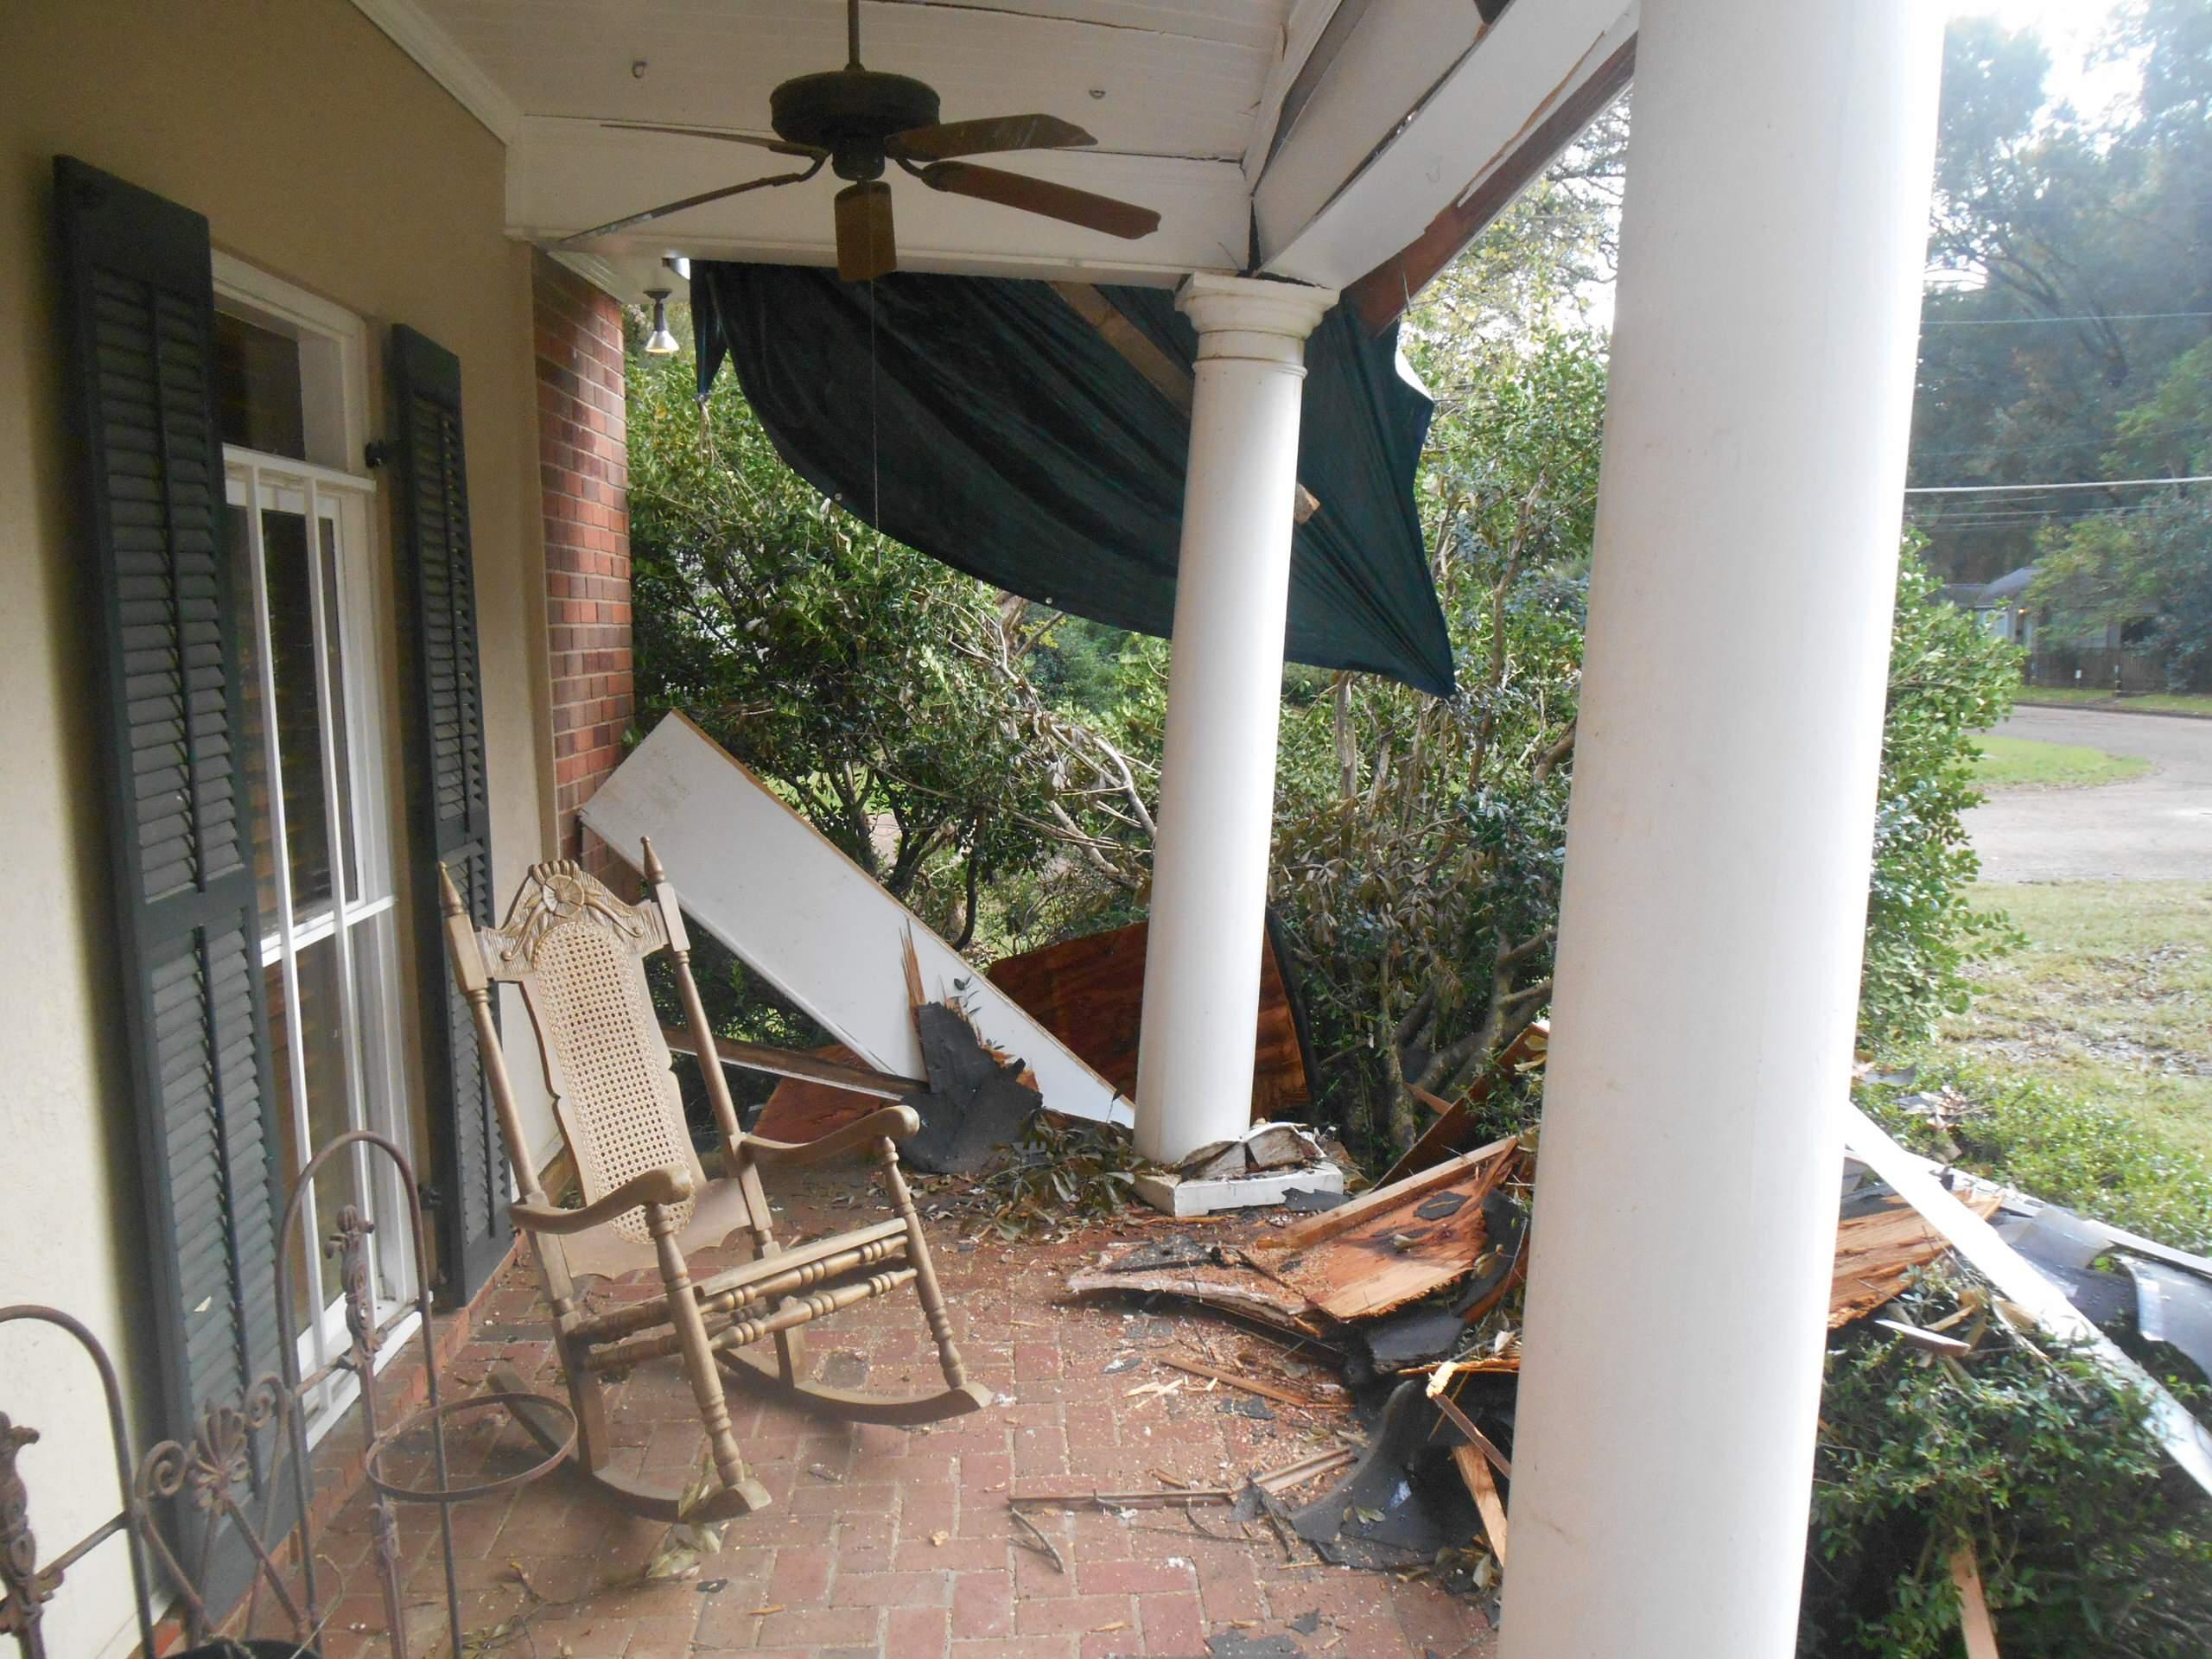 Tree Damage/Exterior Upgrade